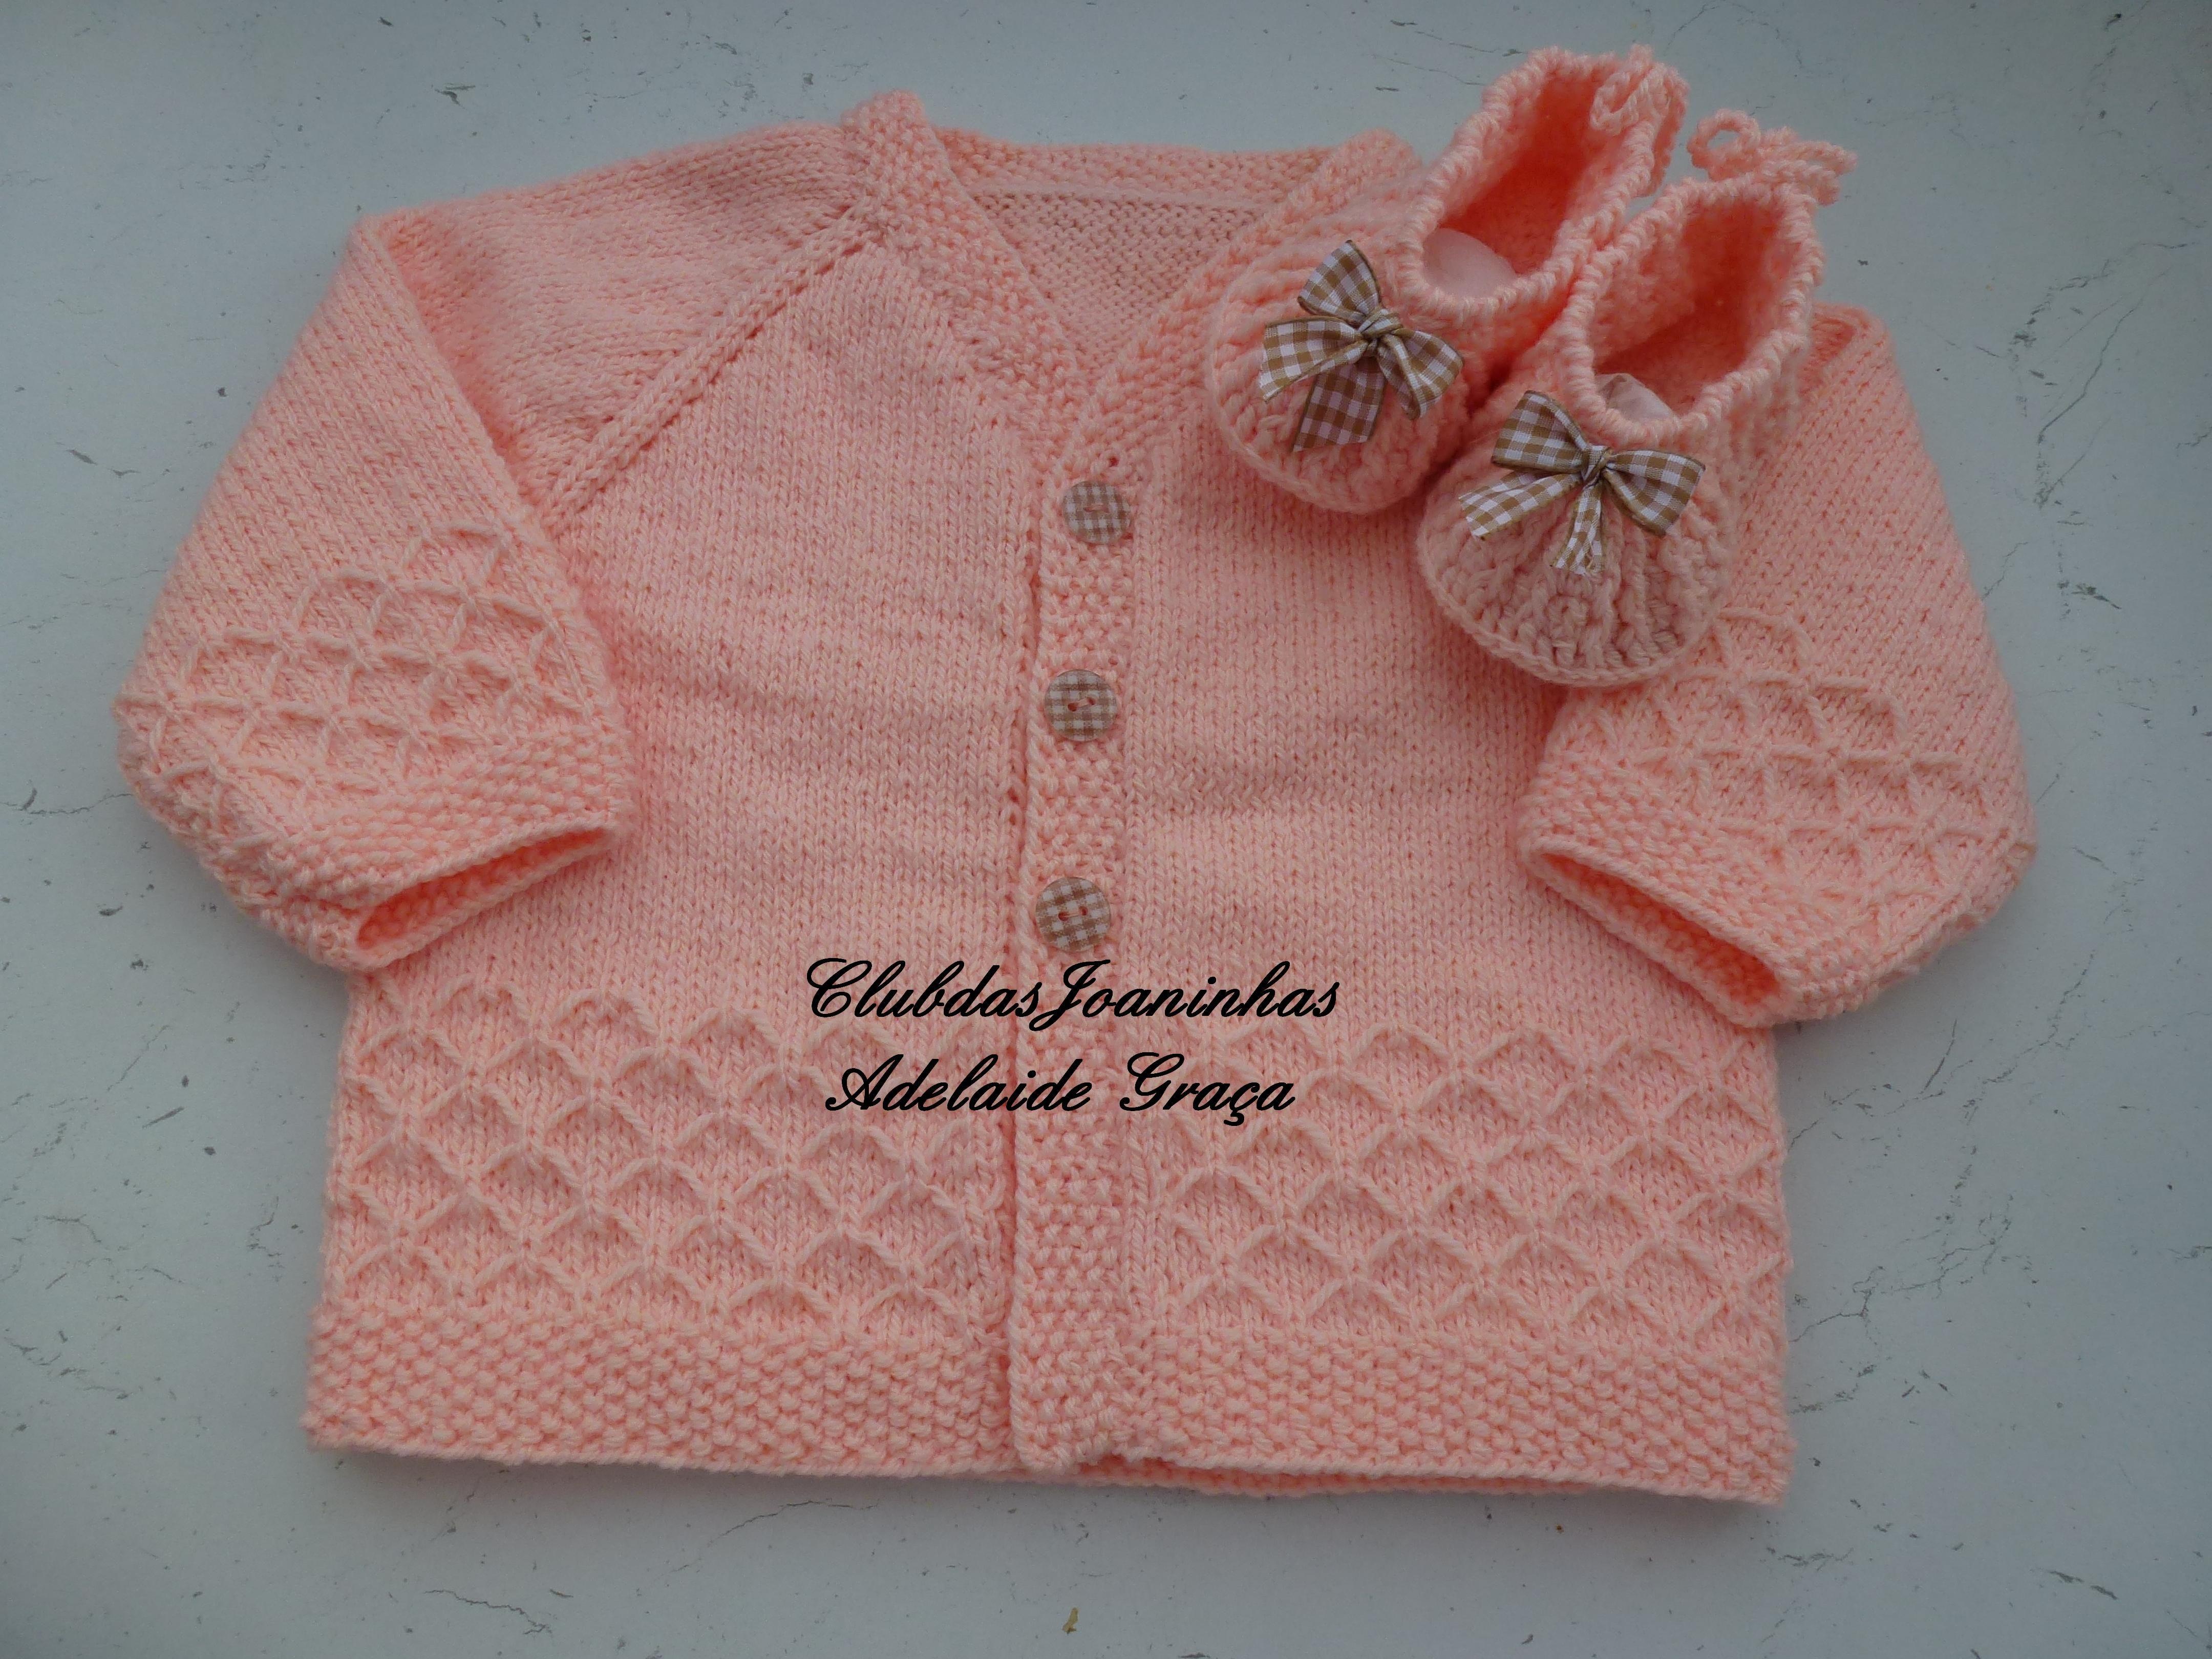 Casaco salmo bebeklere zel gzel pinterest knitting casaco salmo baby sweaterscardigan sweatersknitting bankloansurffo Gallery